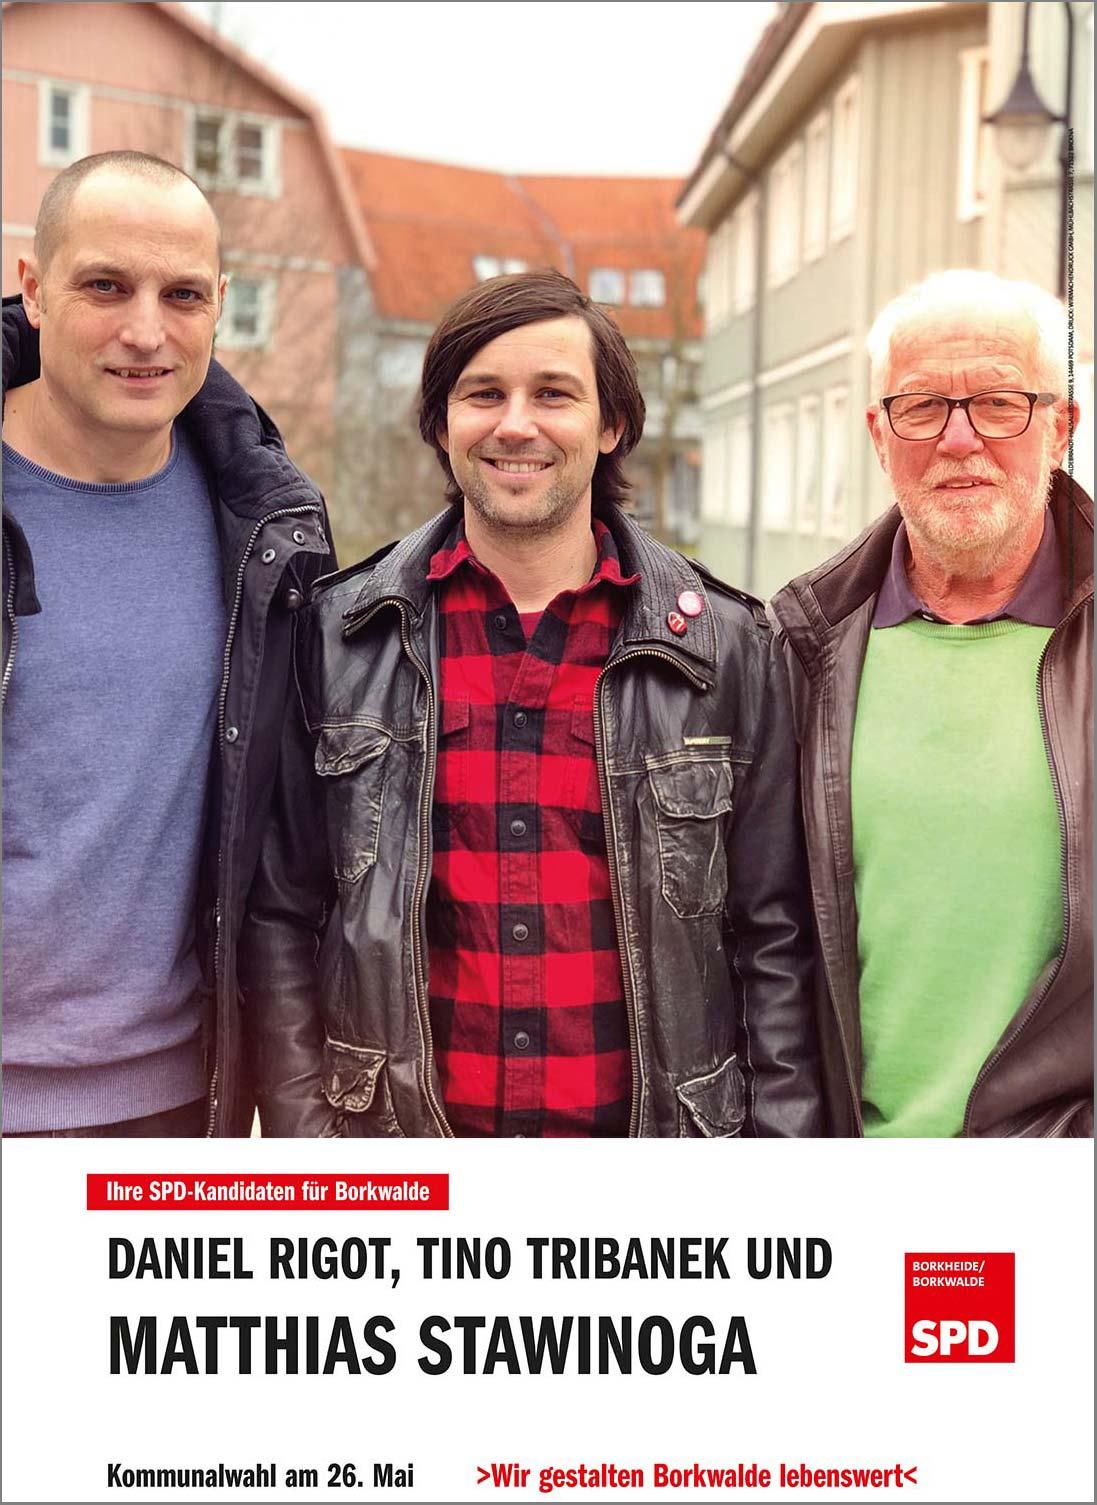 SPD_Borkwalde_Kandidaten